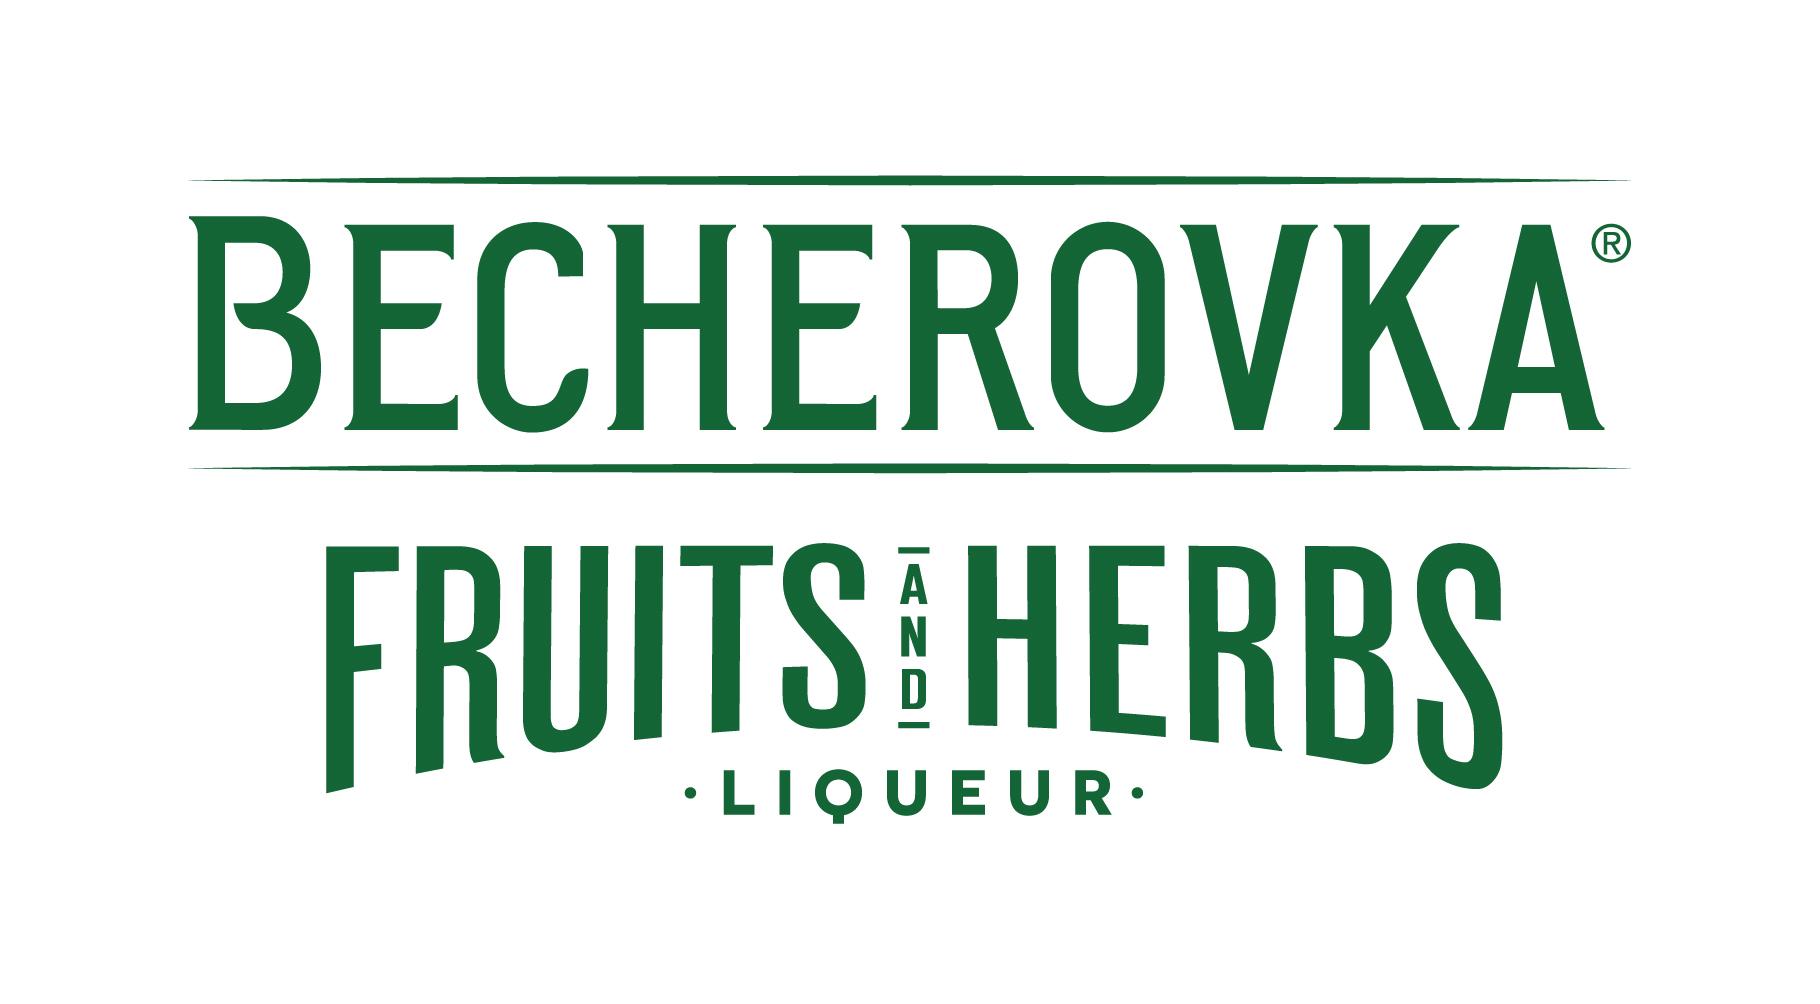 Becherovka Lemond | Pernod Ricard